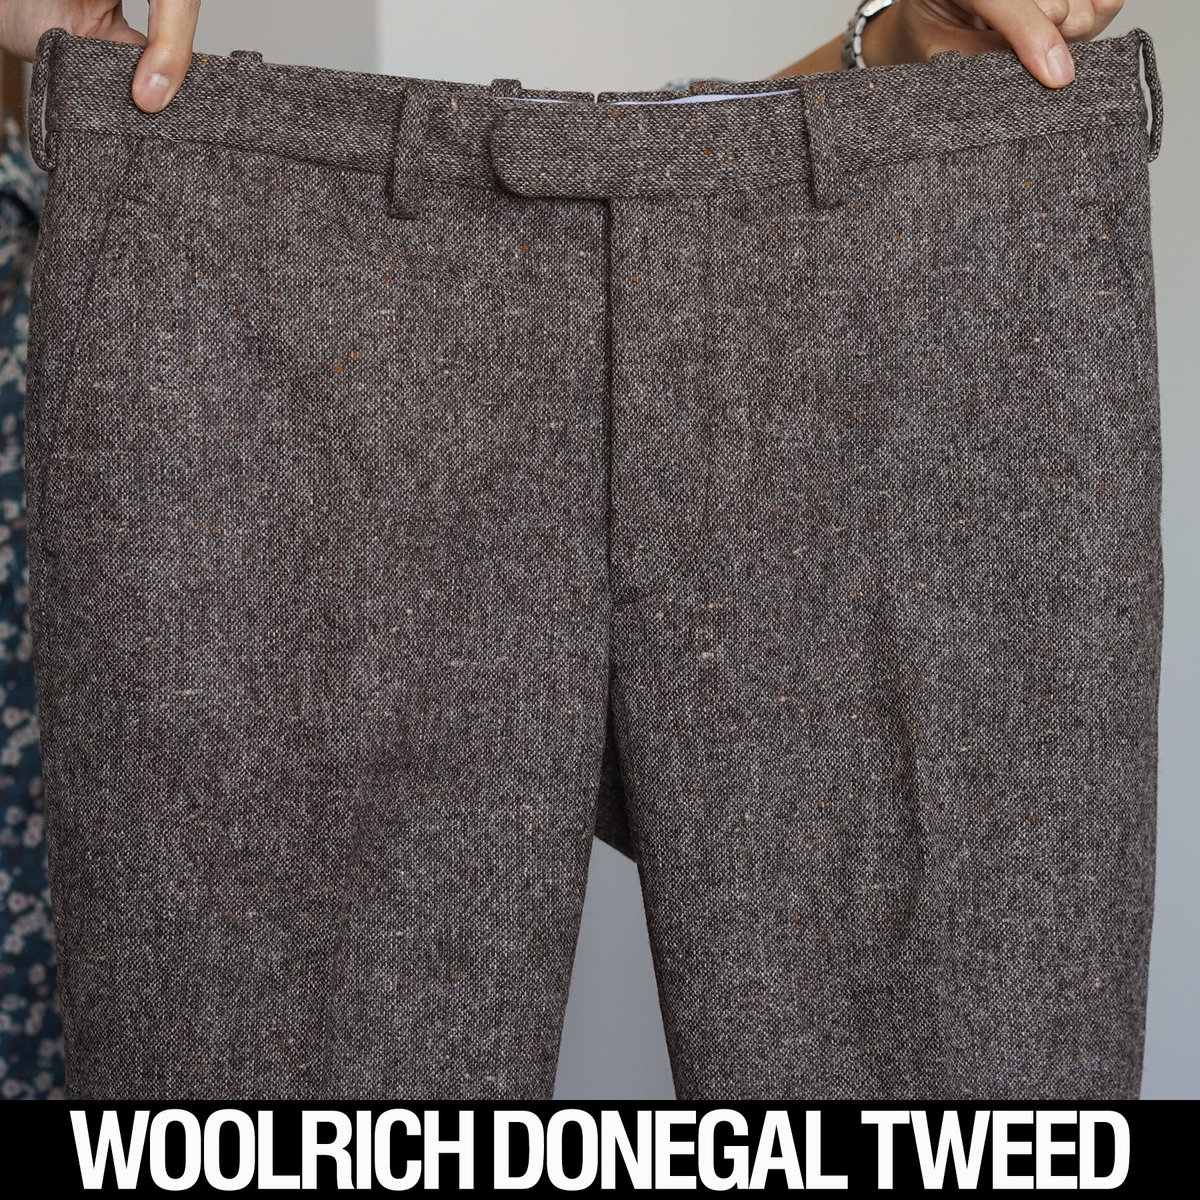 WOOLRICH DONEGAL.jpg